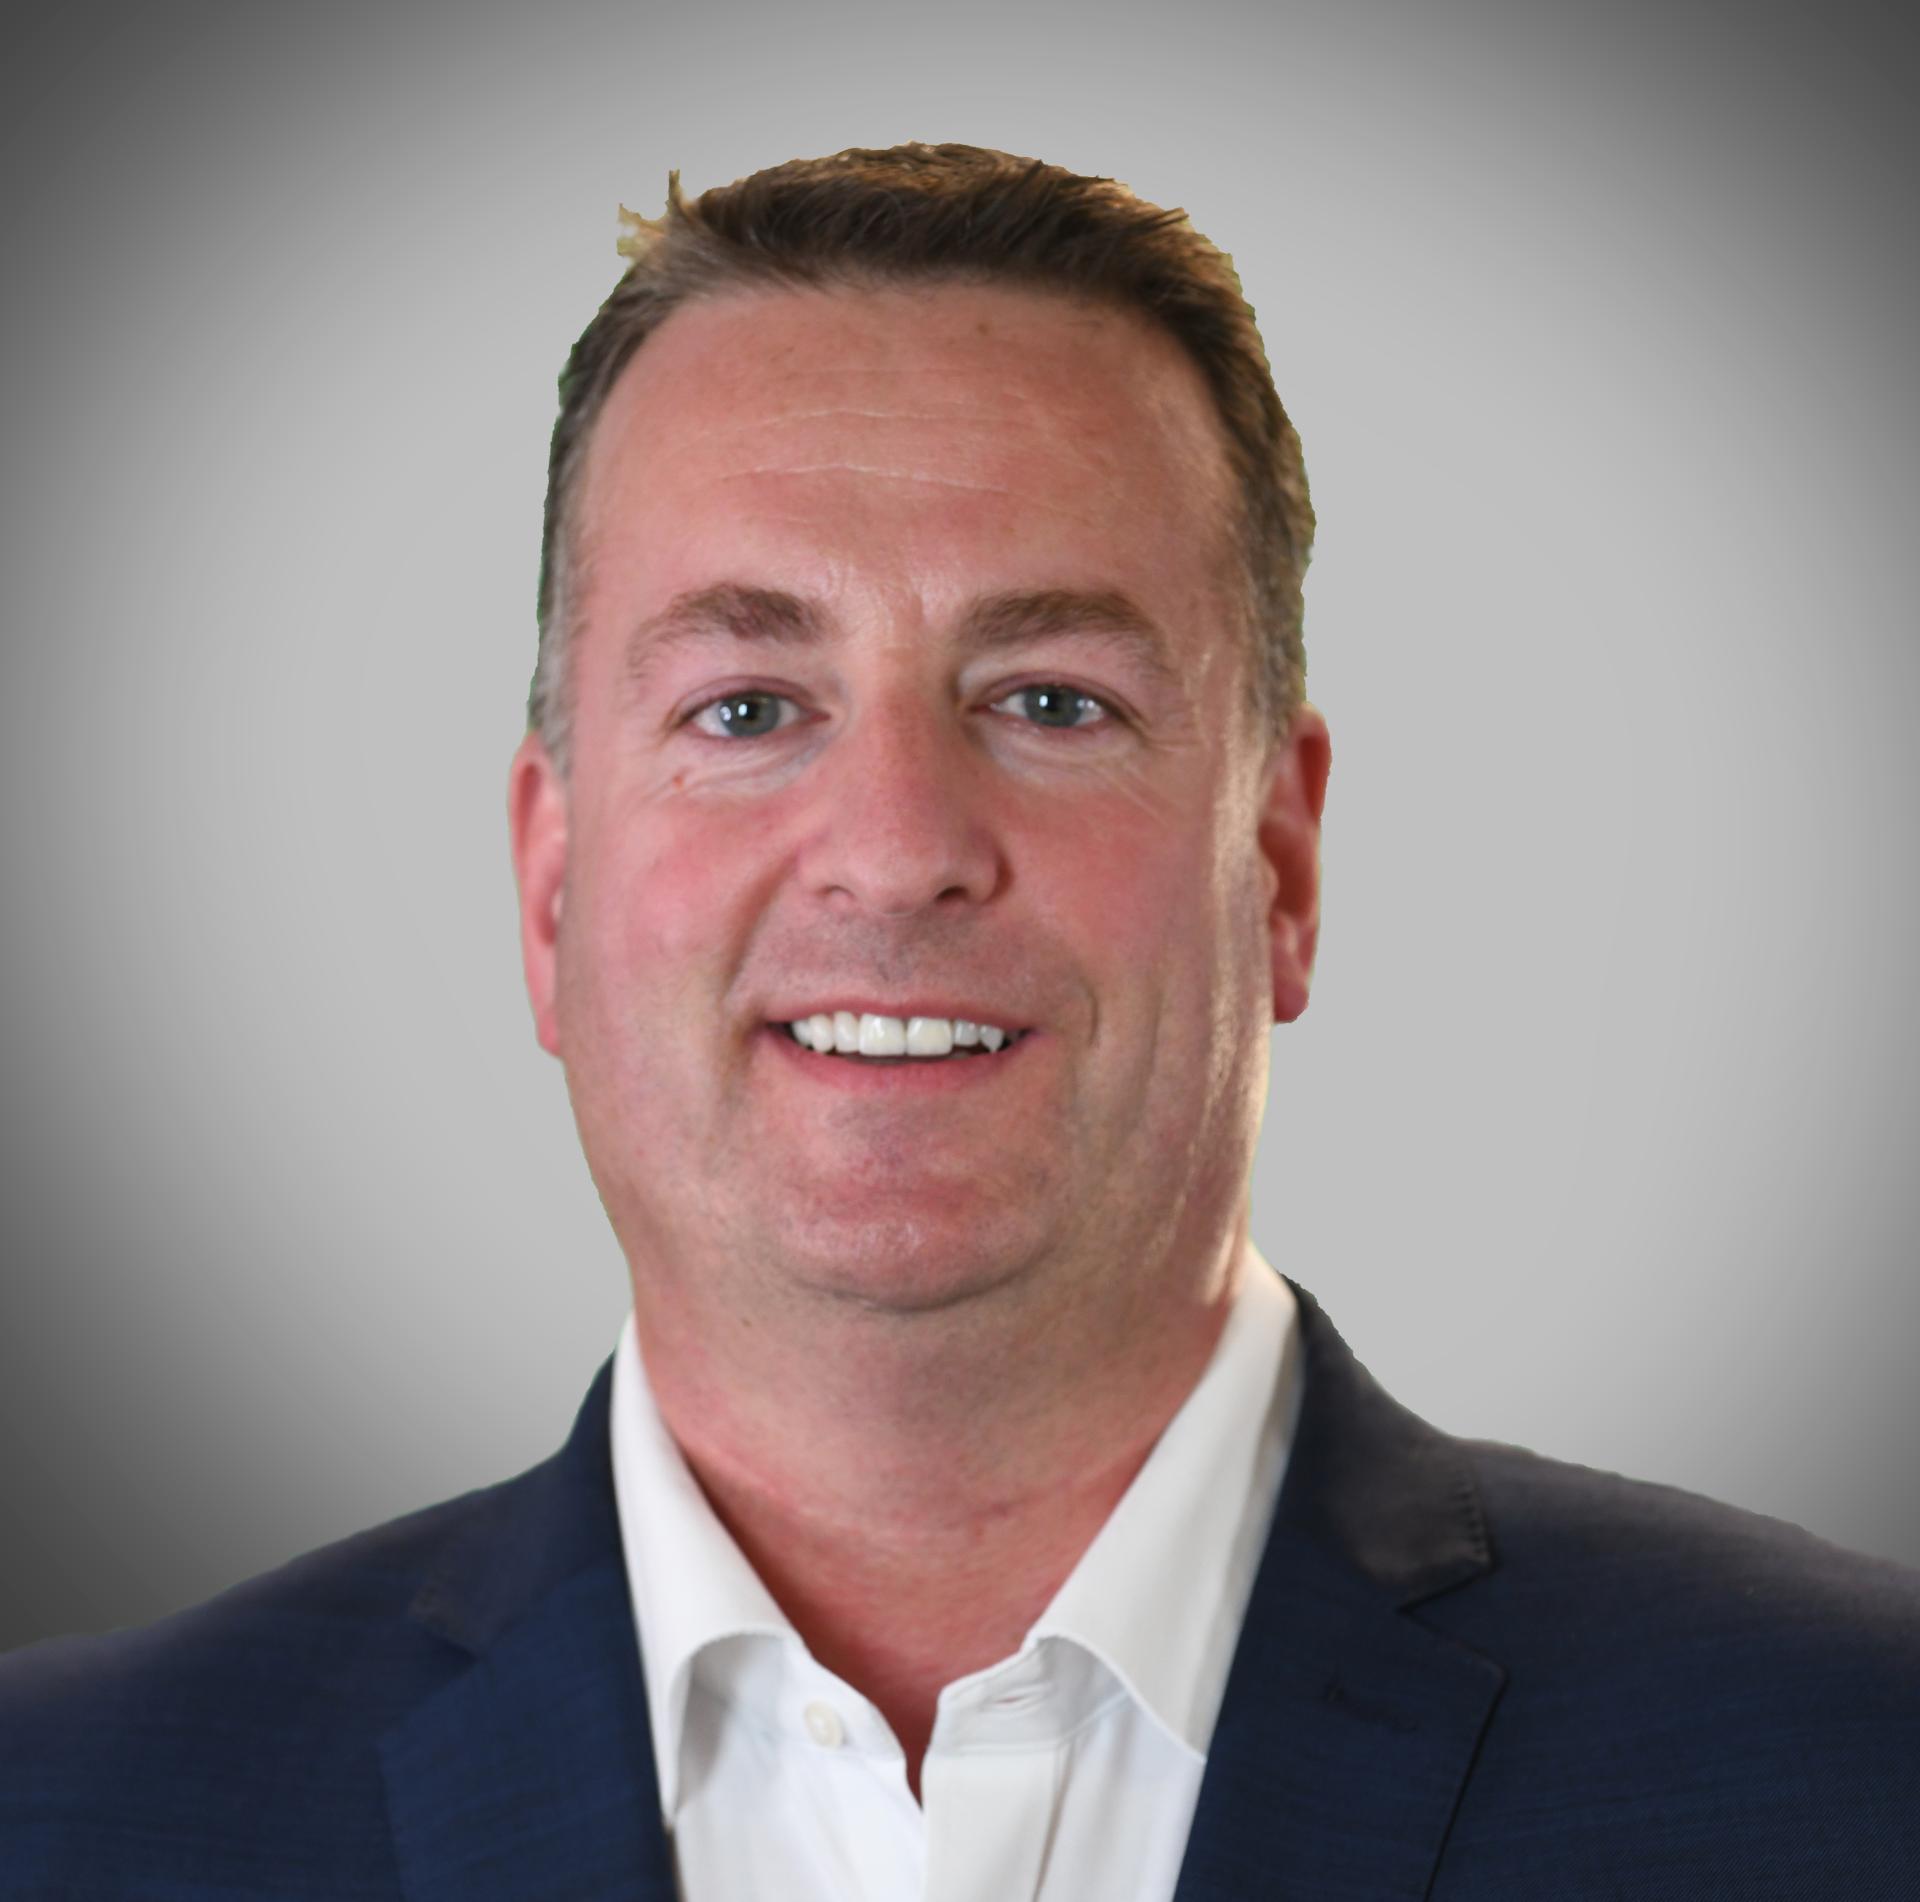 David Devany - Online Managing Director